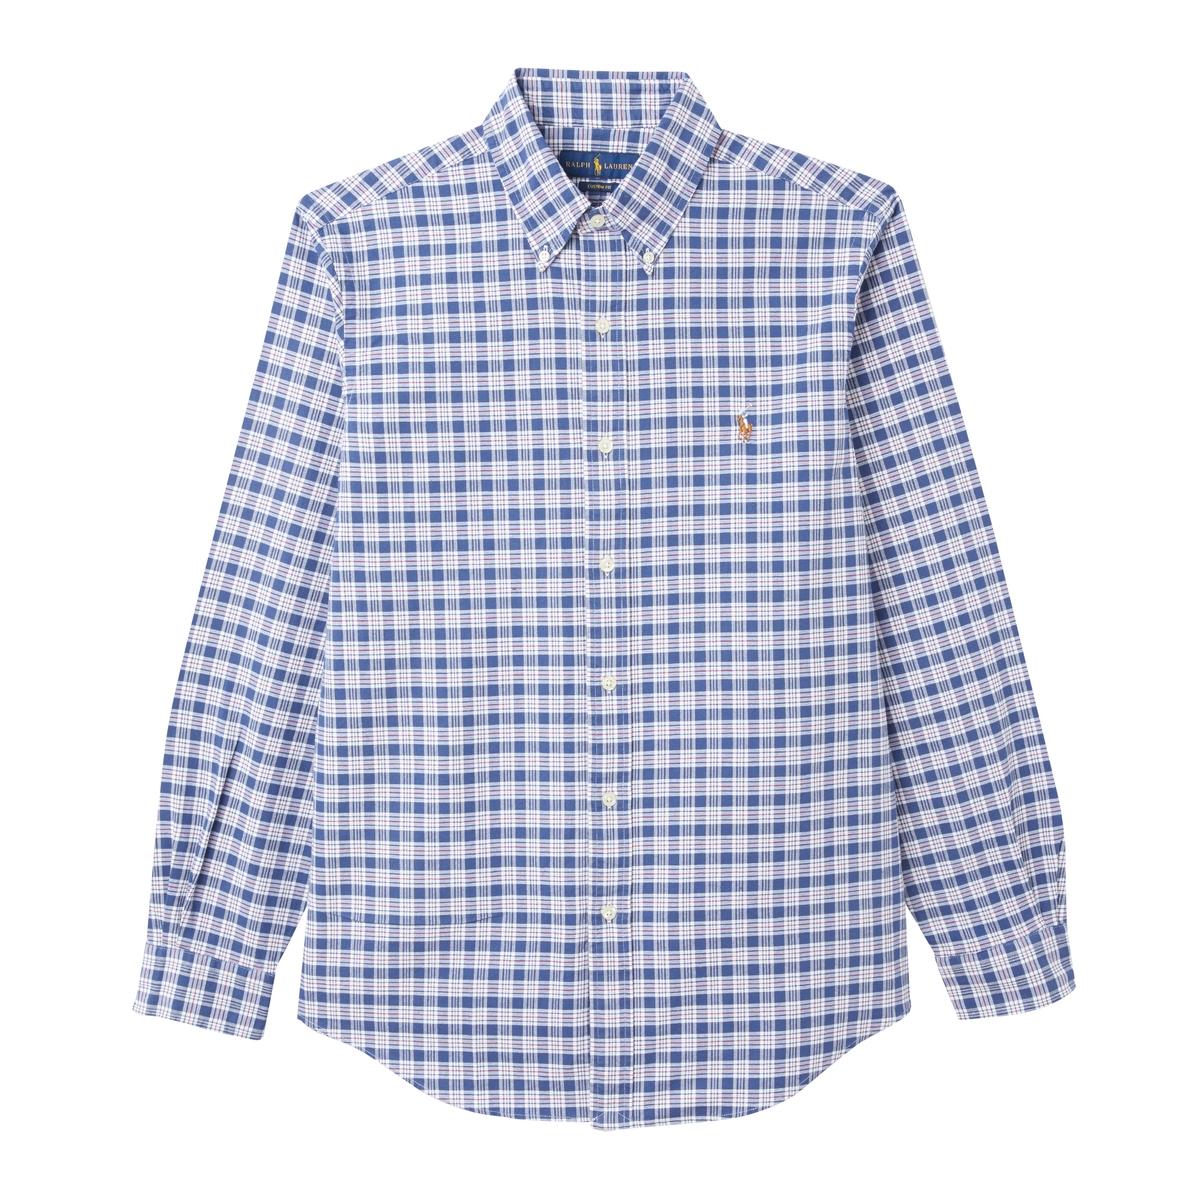 Рубашка La Redoute Прямая из ткани оксфорд S синий рубашка la redoute джинсовая узкая jjesheridan s синий